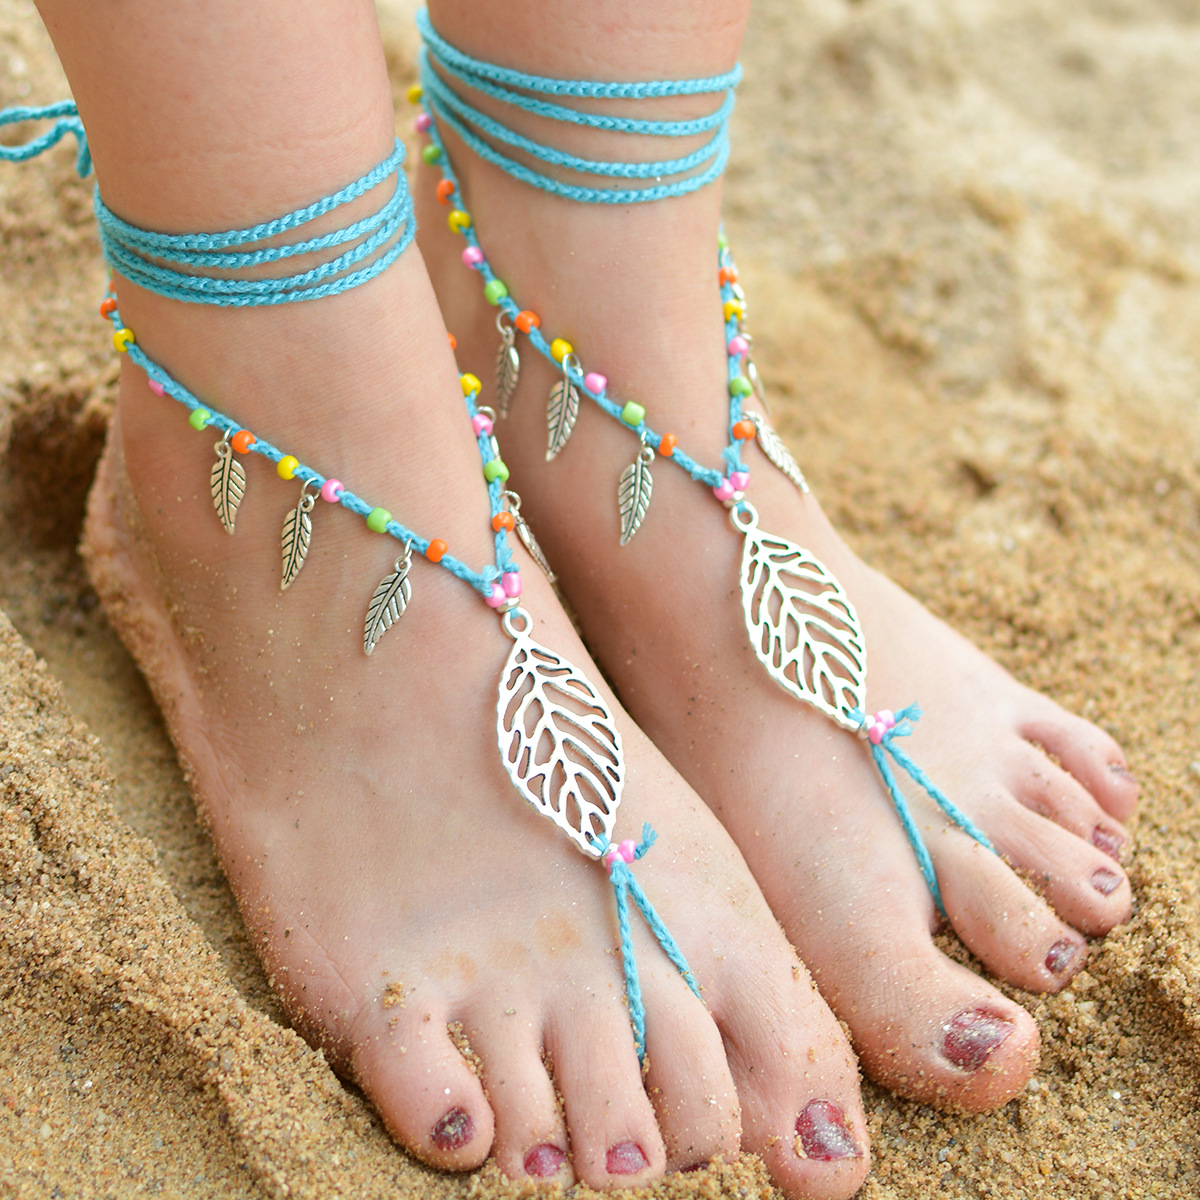 2017 Rope Slave Ankle Bracelet Beach Crochet Handmade Beads Cotton Barefoot  Sandals Women Boho Vintage Leaf Tassel Bridal Anklet